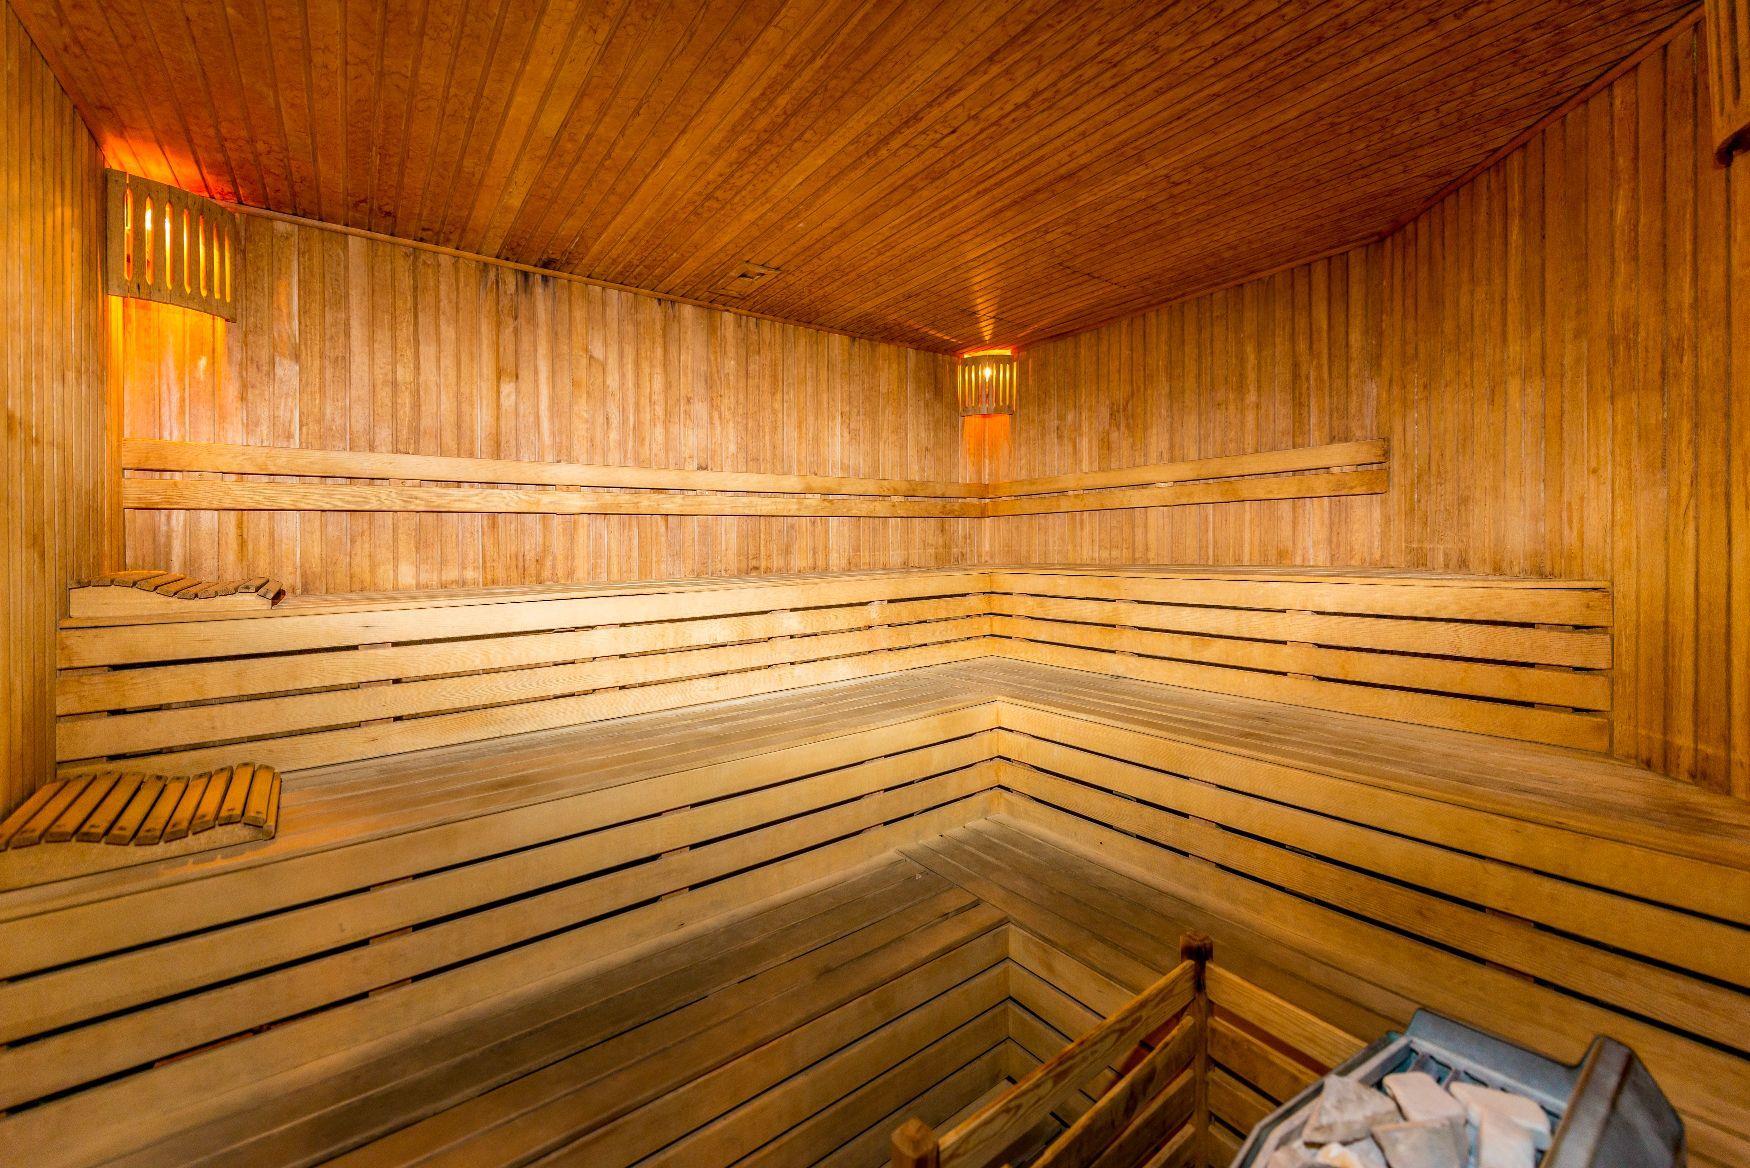 http://www.orextravel.sk/OREX/hotelphotos/vonresort-golden-coast-general-0029.jpg